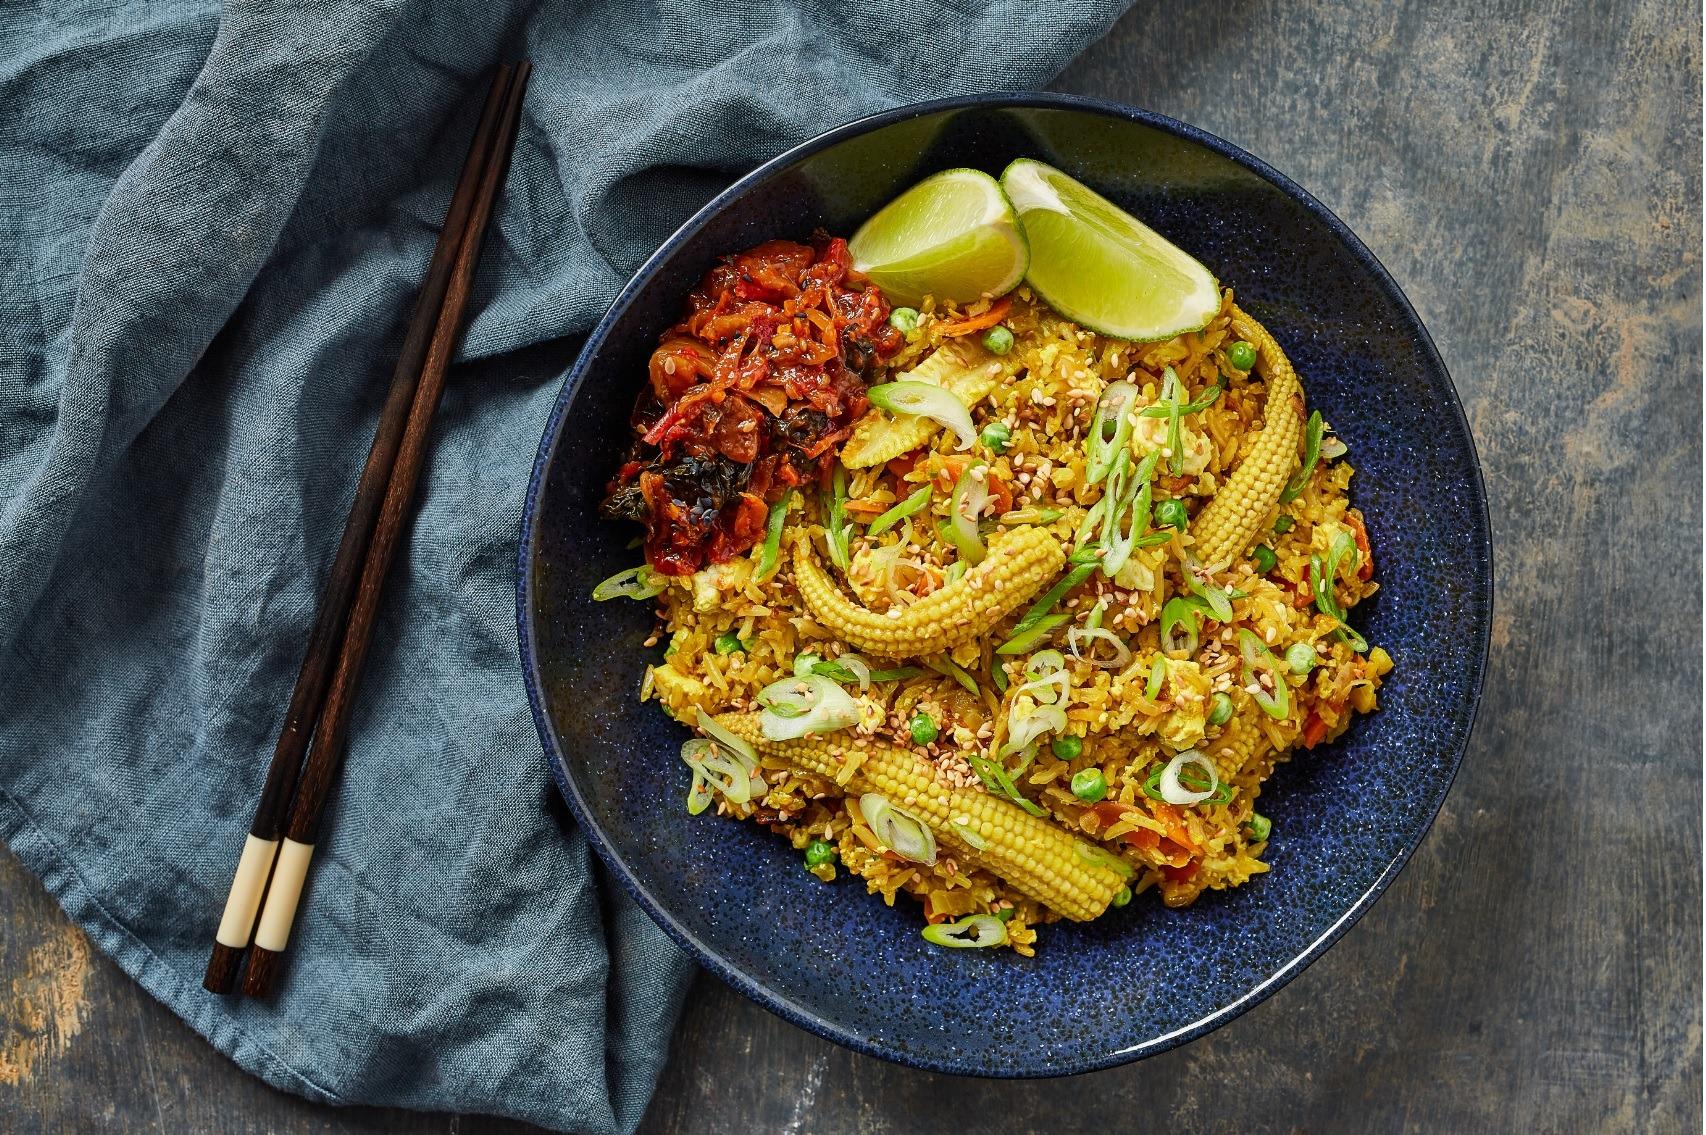 Vegan tofu-fried rice